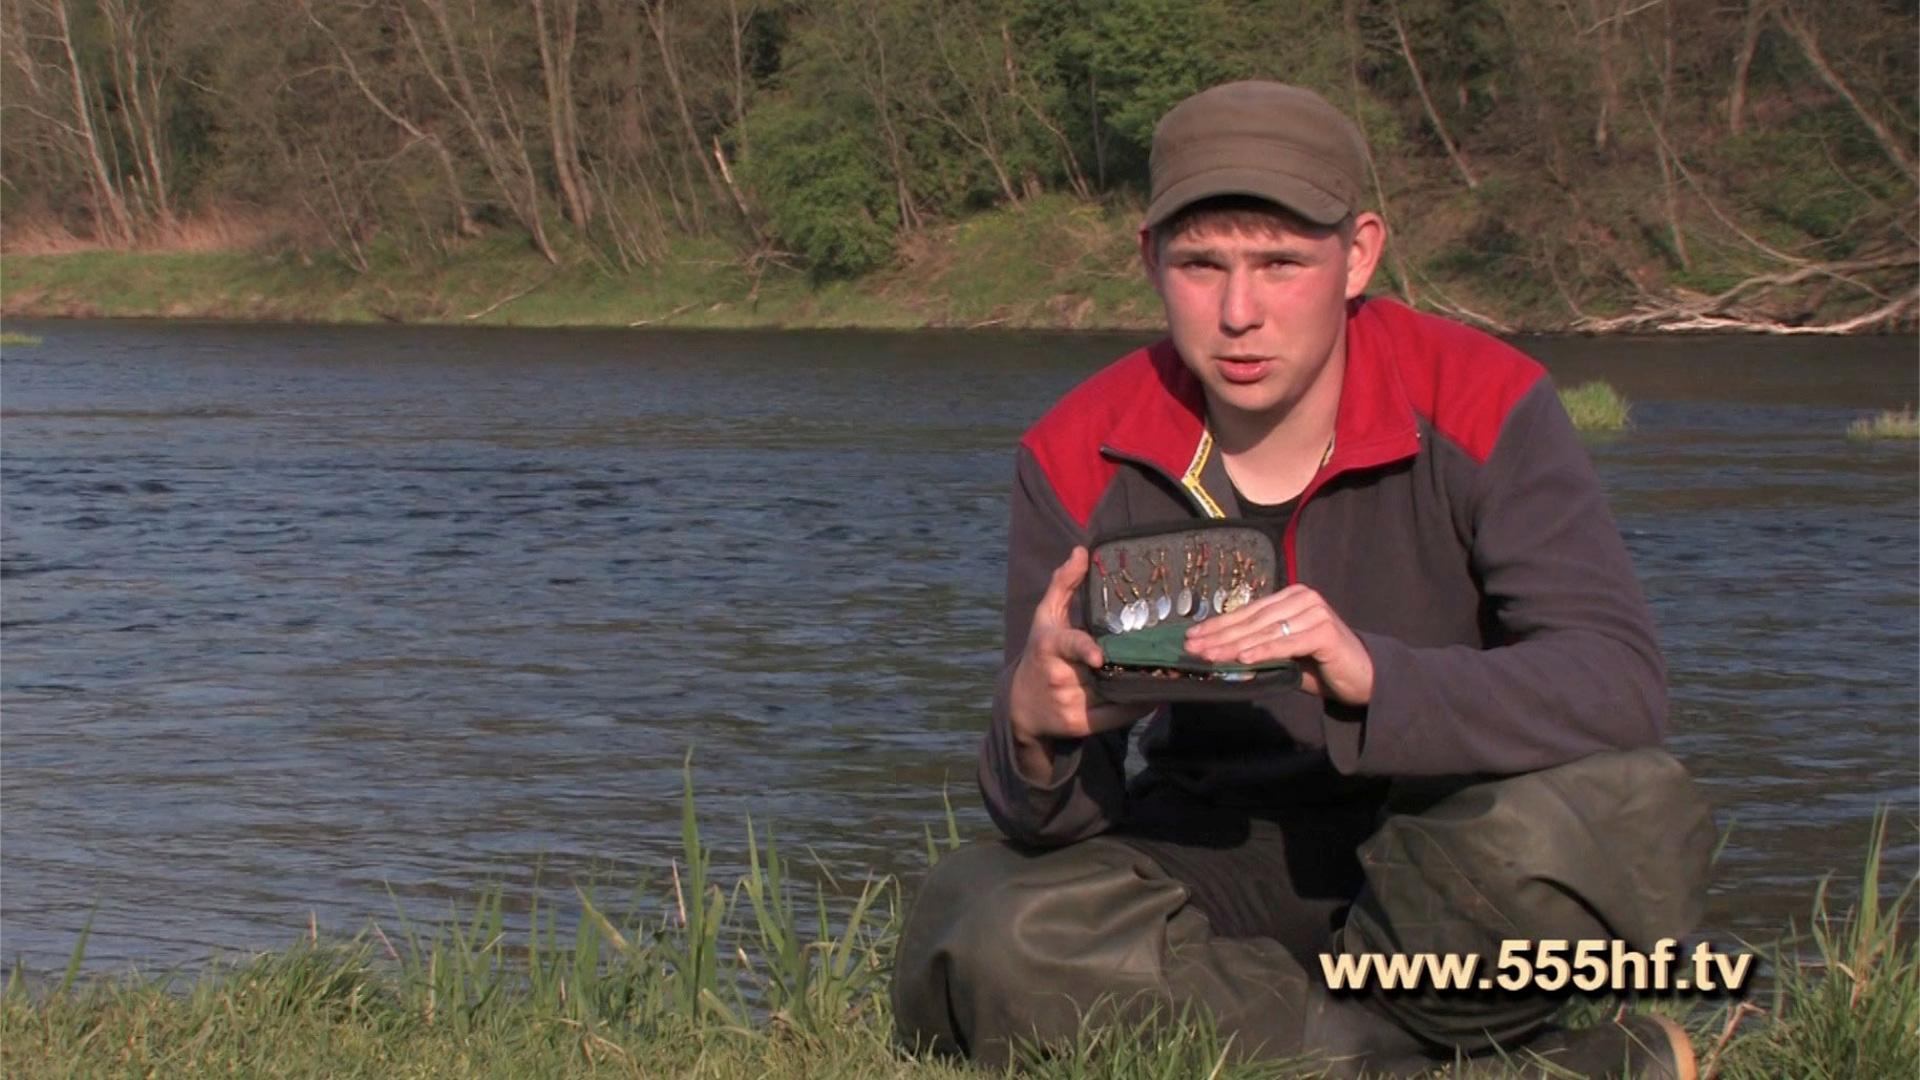 дэн вихров рыбалка